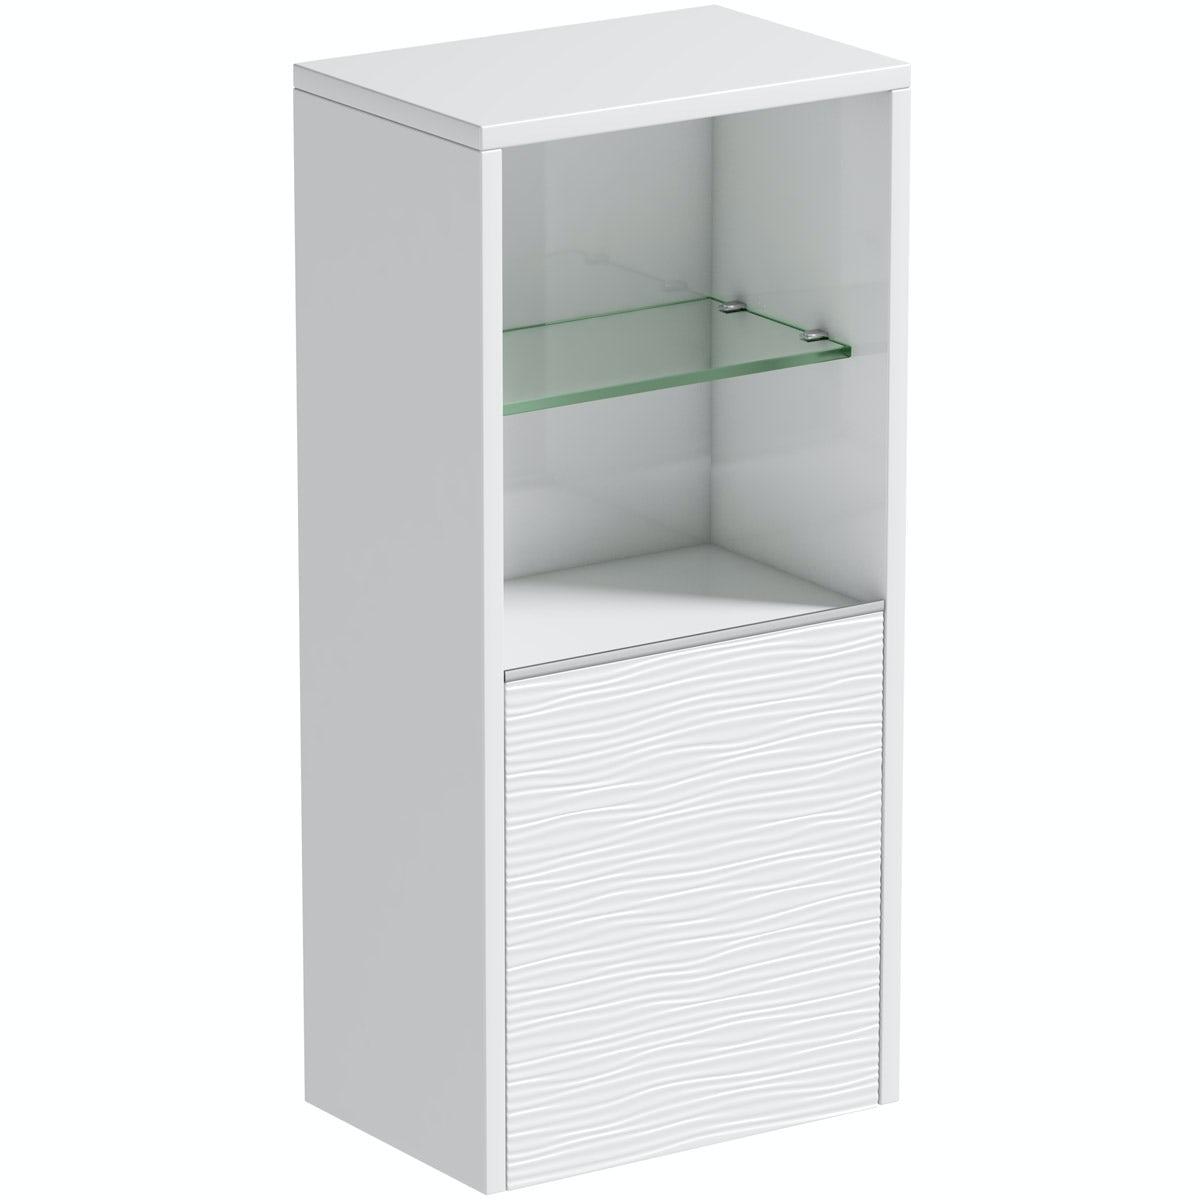 Mode Banks matt white wall storage unit 330mm